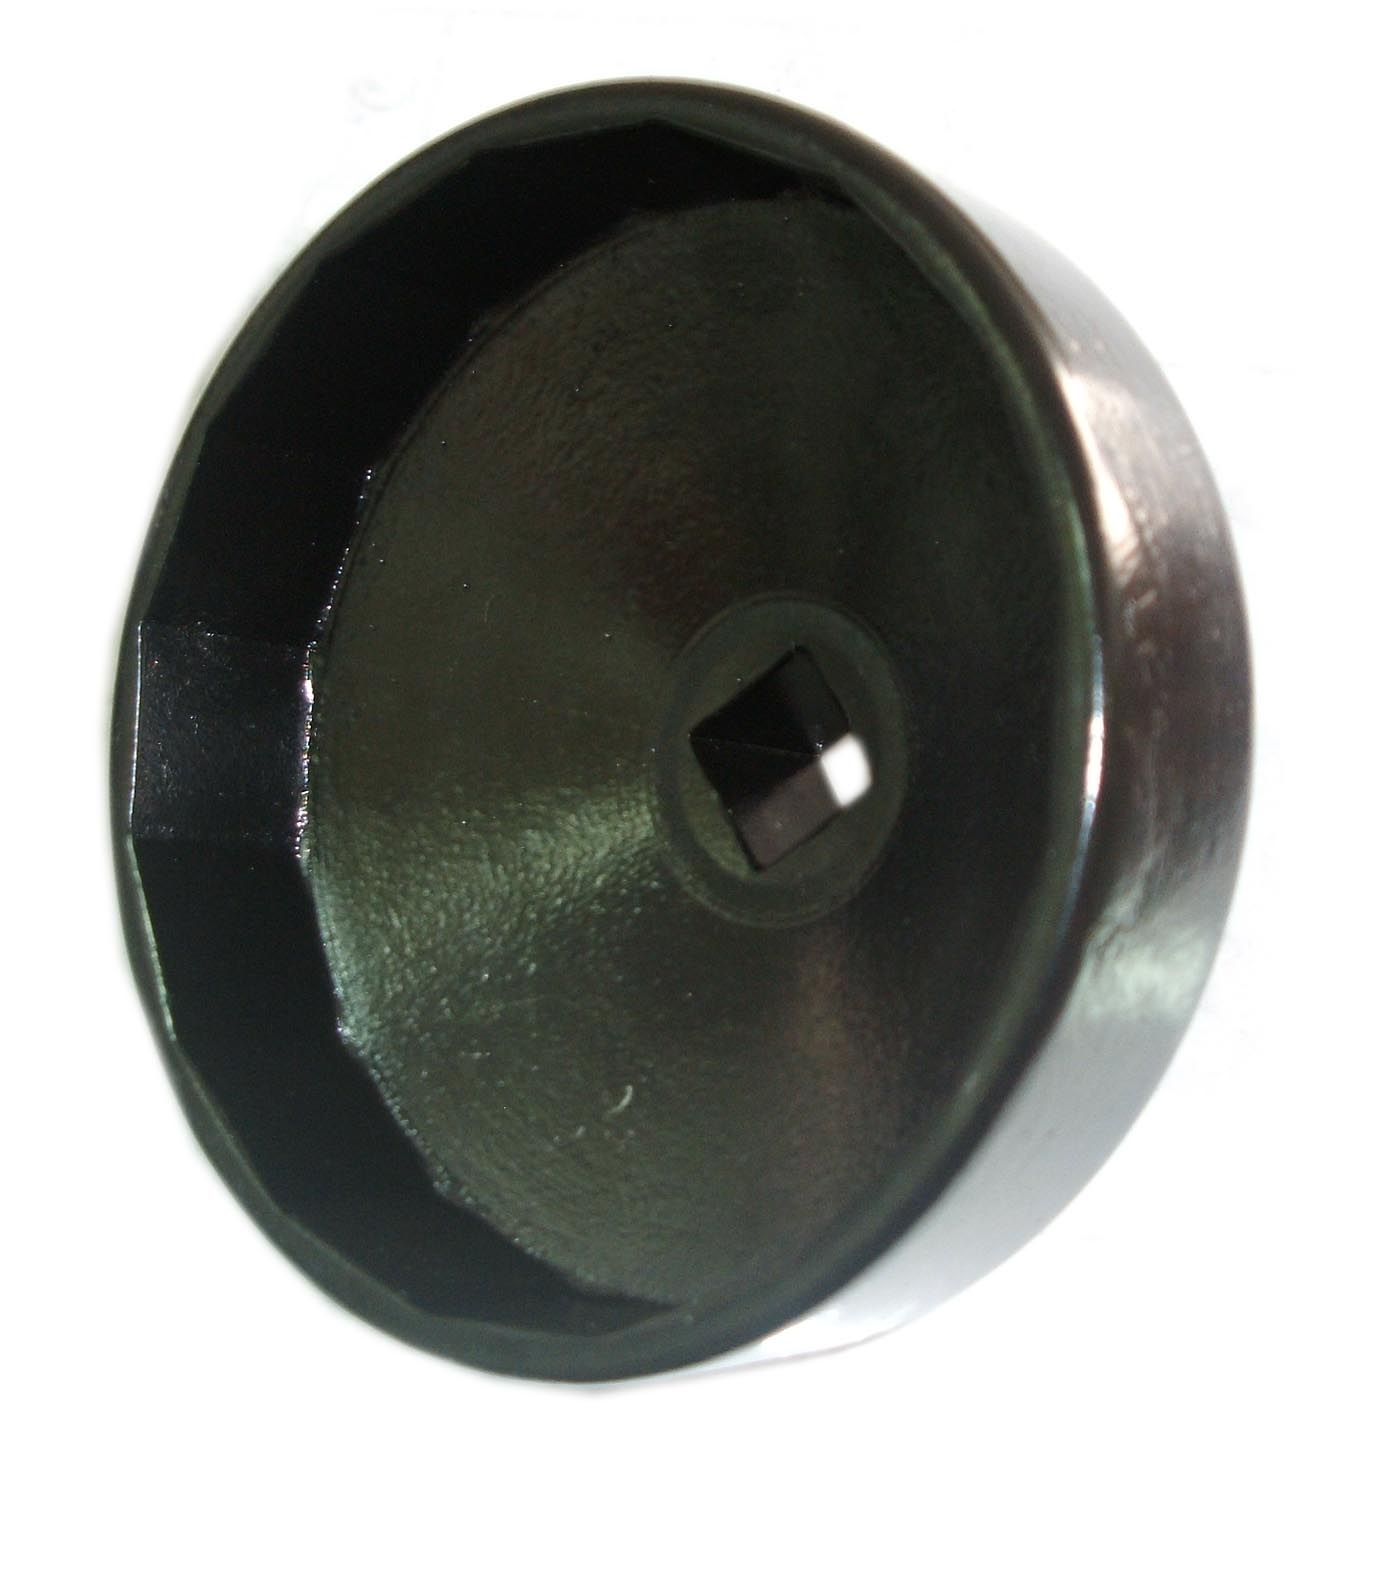 Ключ масляного фильтра HYUNDAI TRAJET 82 мм 18гр. Car-Tool CT-A1166